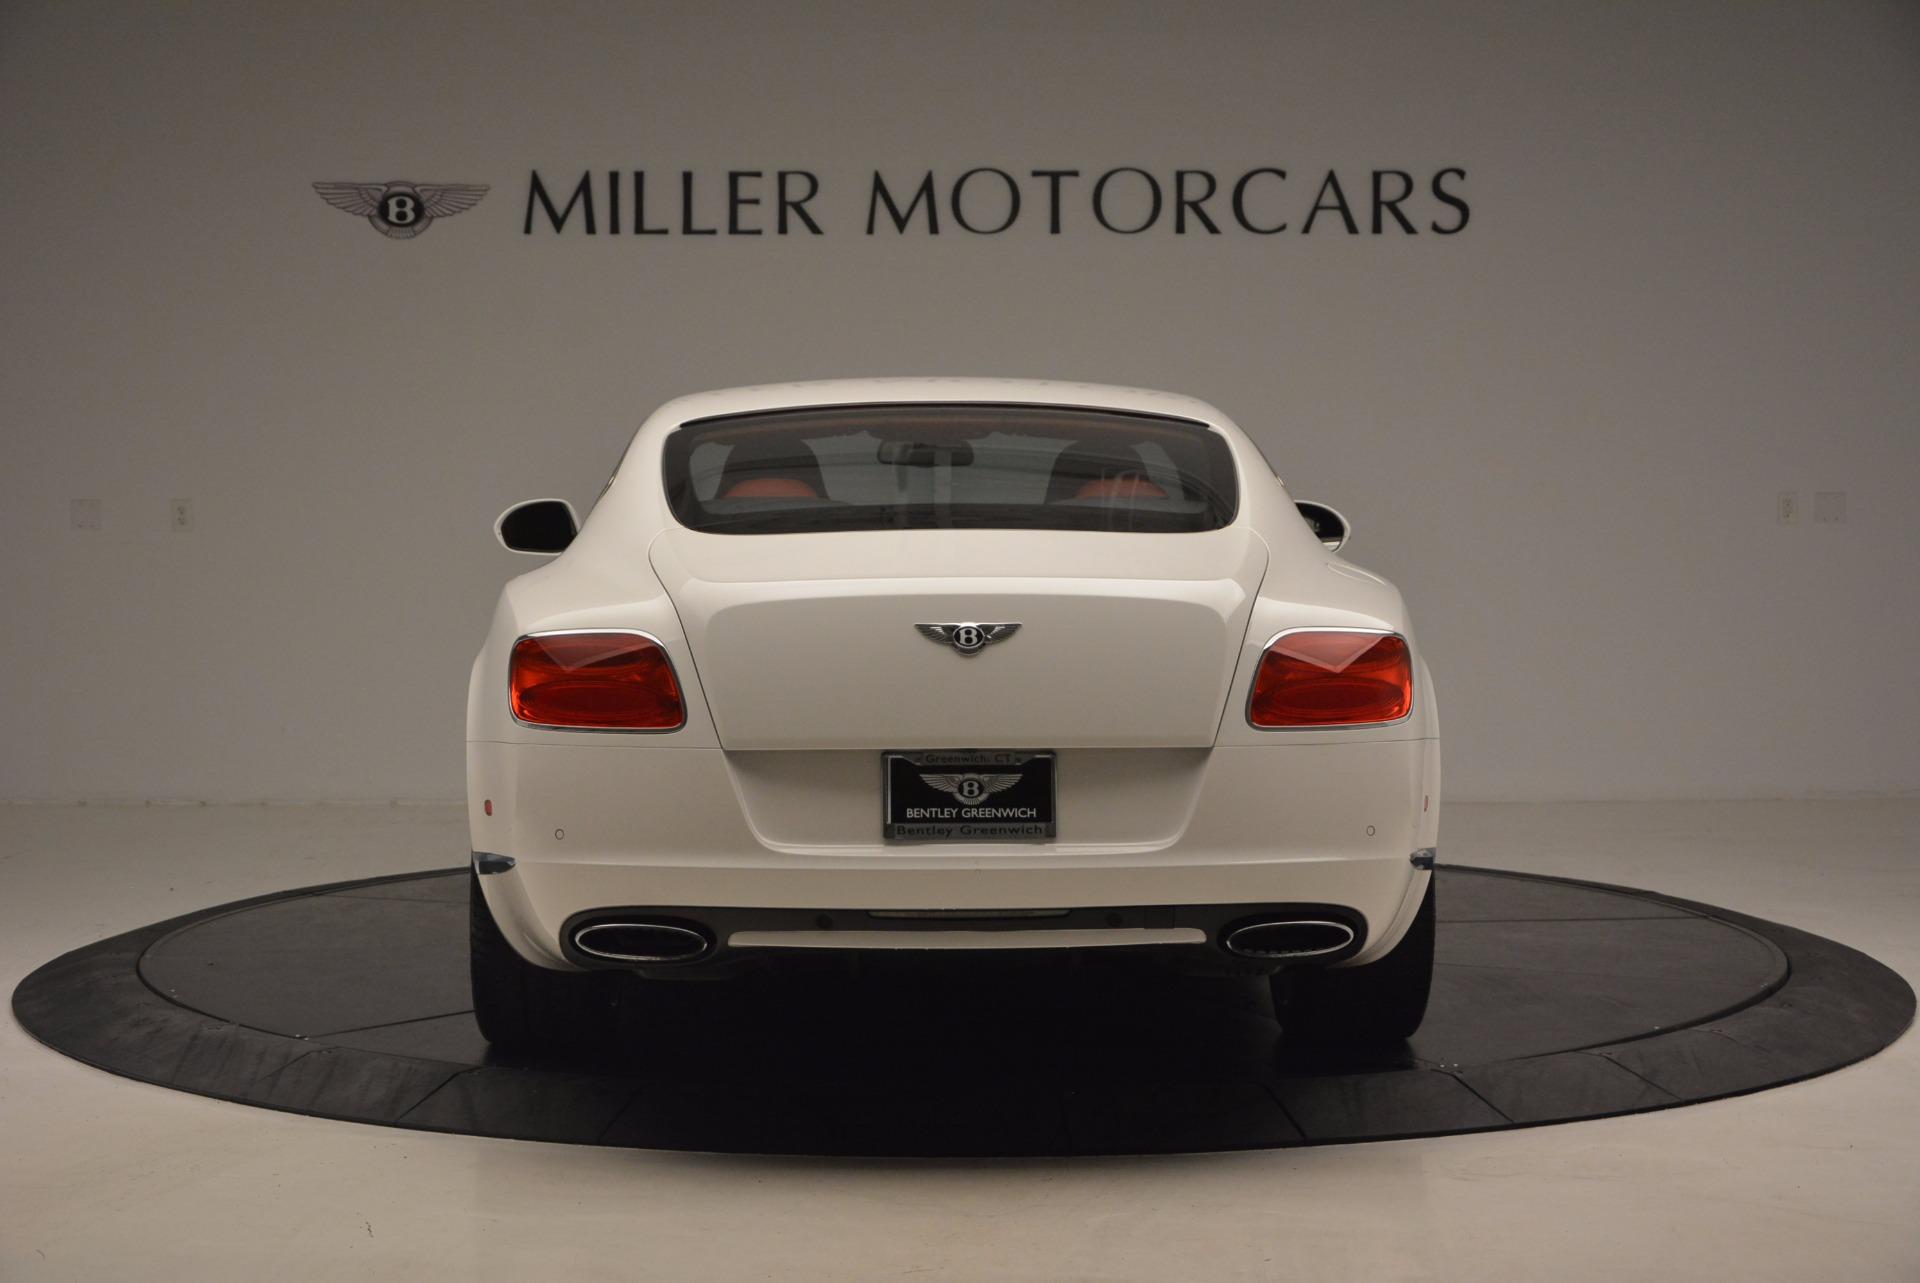 Used 2014 Bentley Continental GT Speed For Sale In Westport, CT 1102_p7